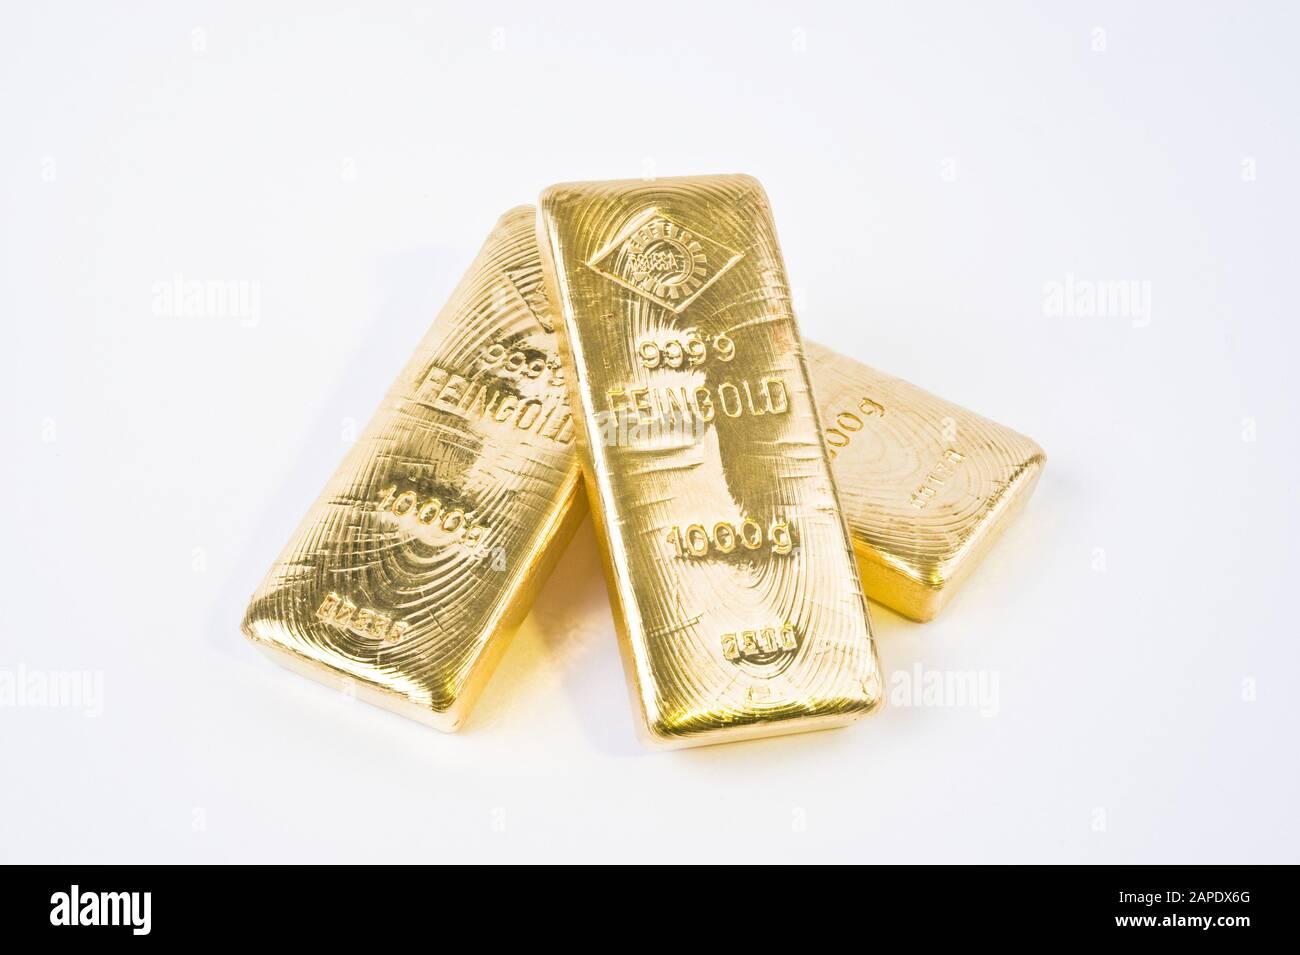 Drei Ögussa-Goldbarren - Three Gold Bars Stock Photo